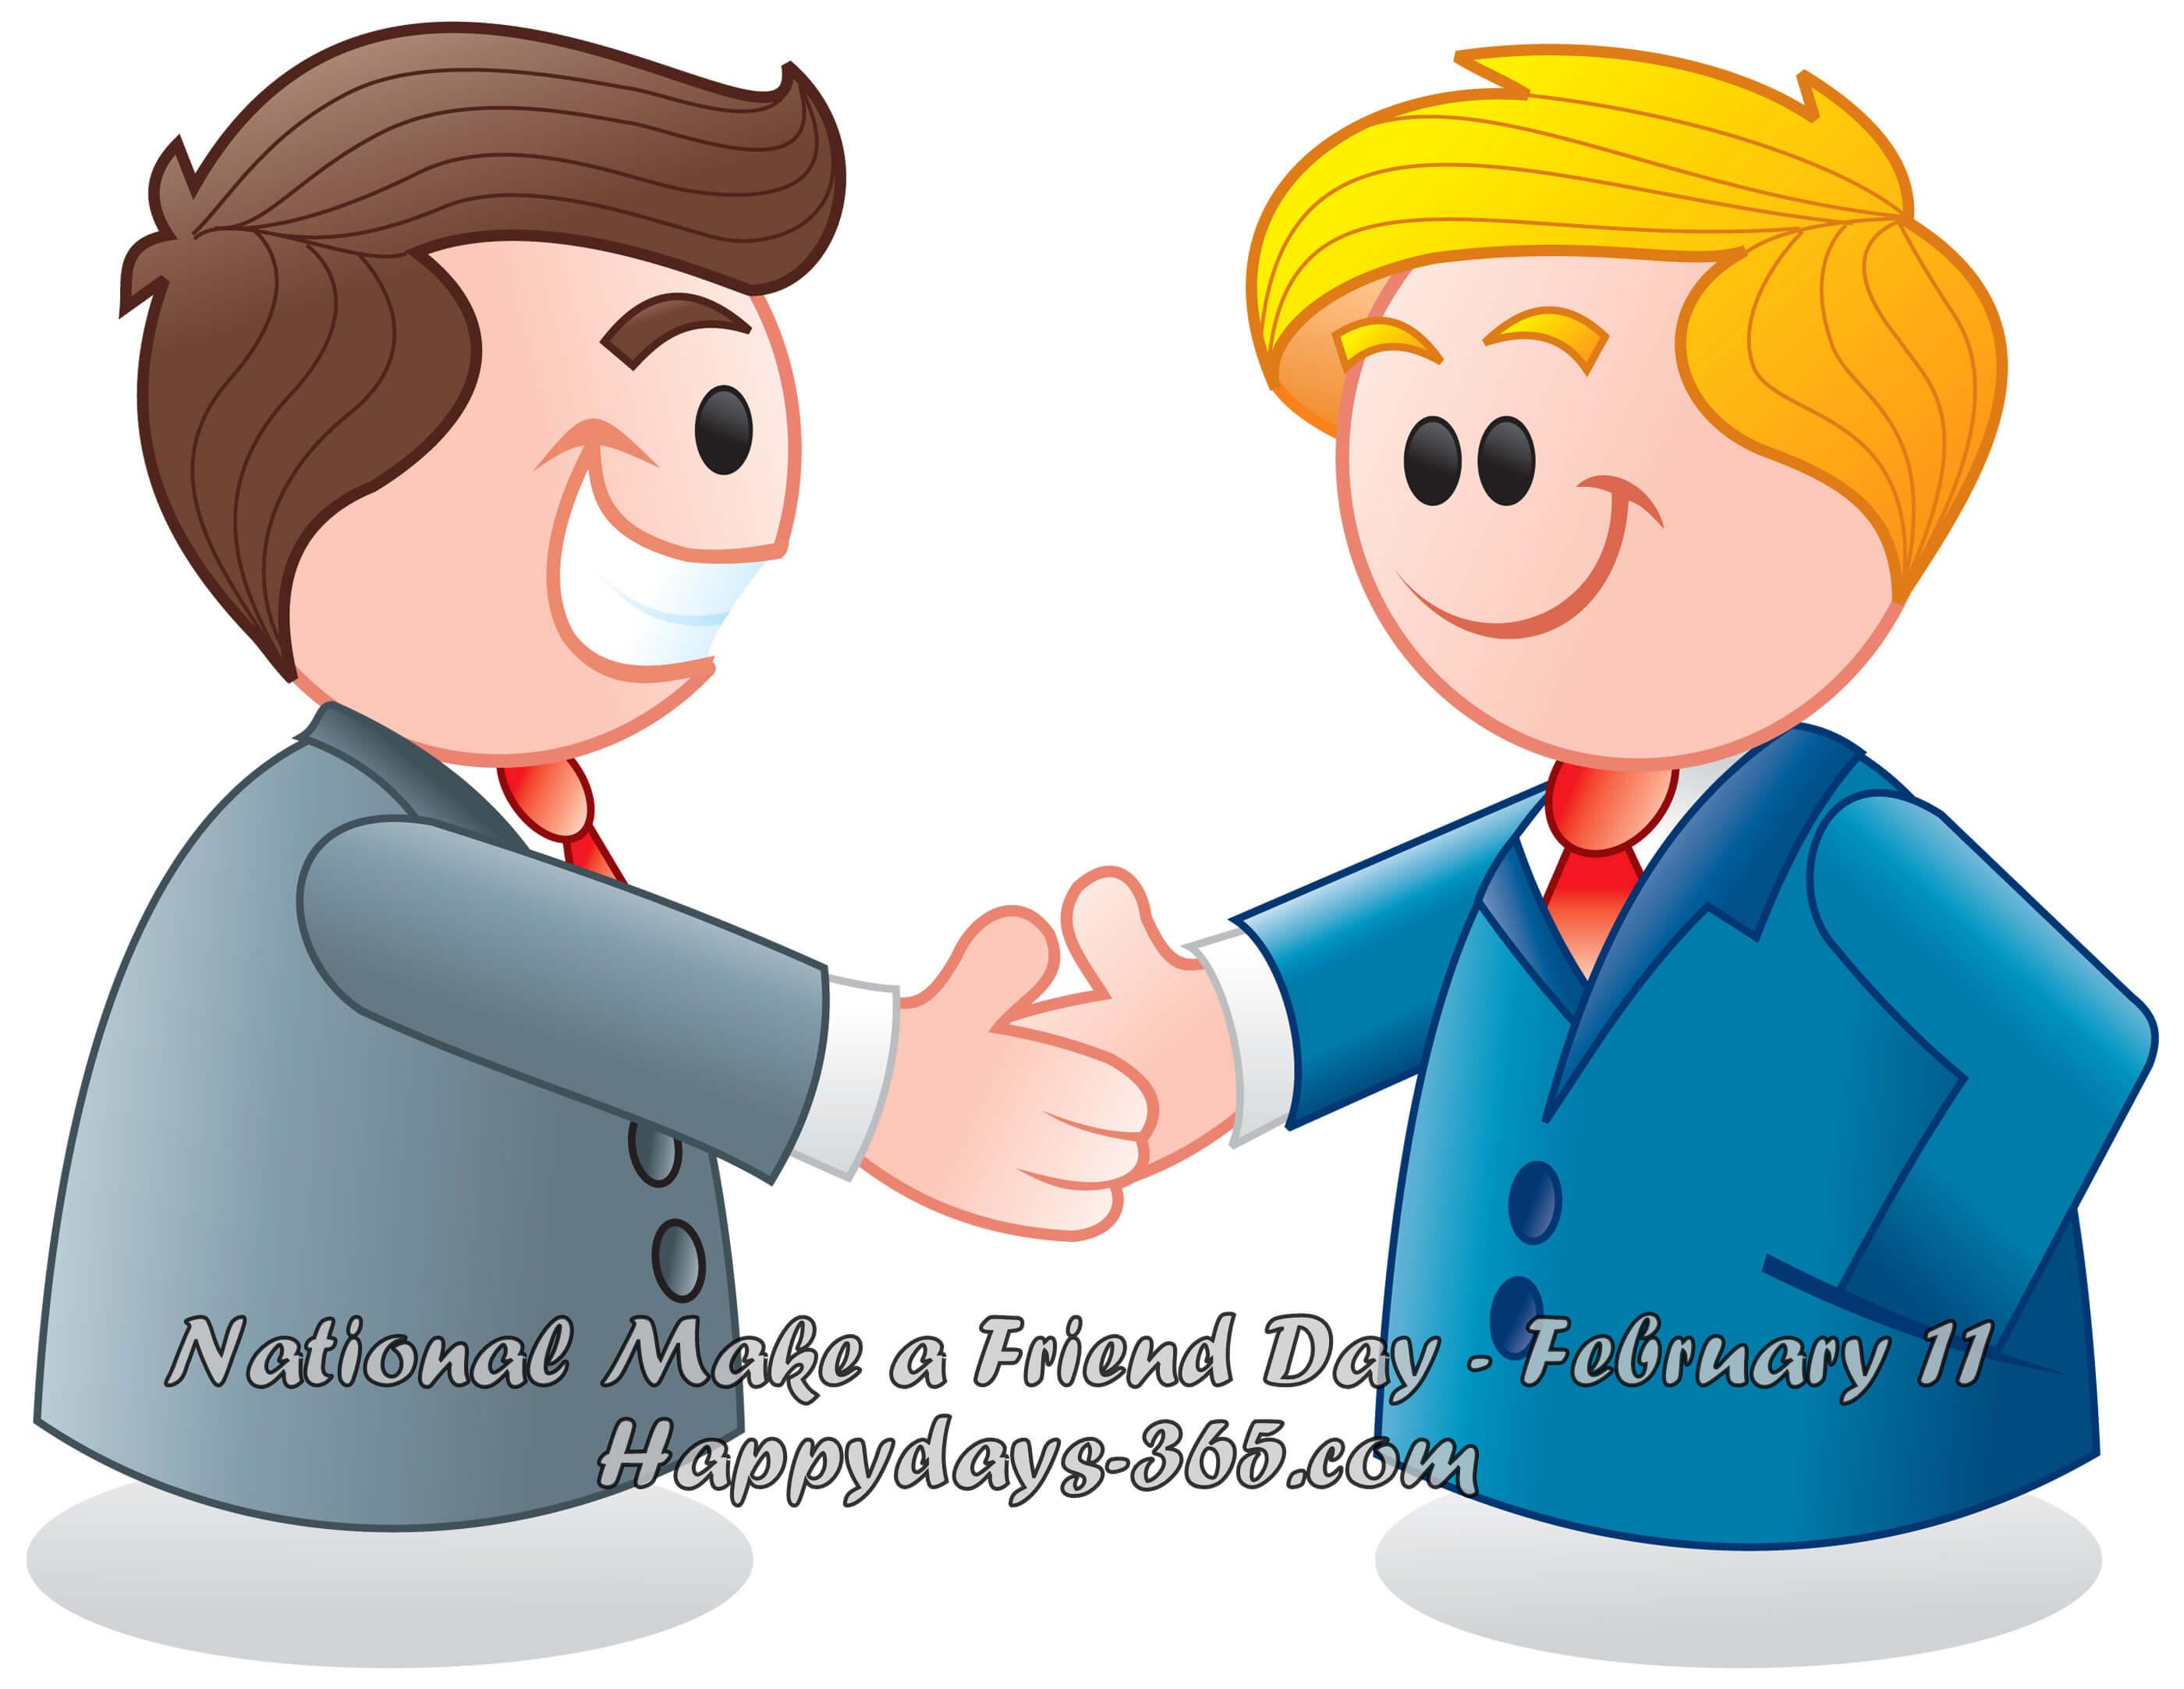 National Make a Friend Day – February 11, 2019